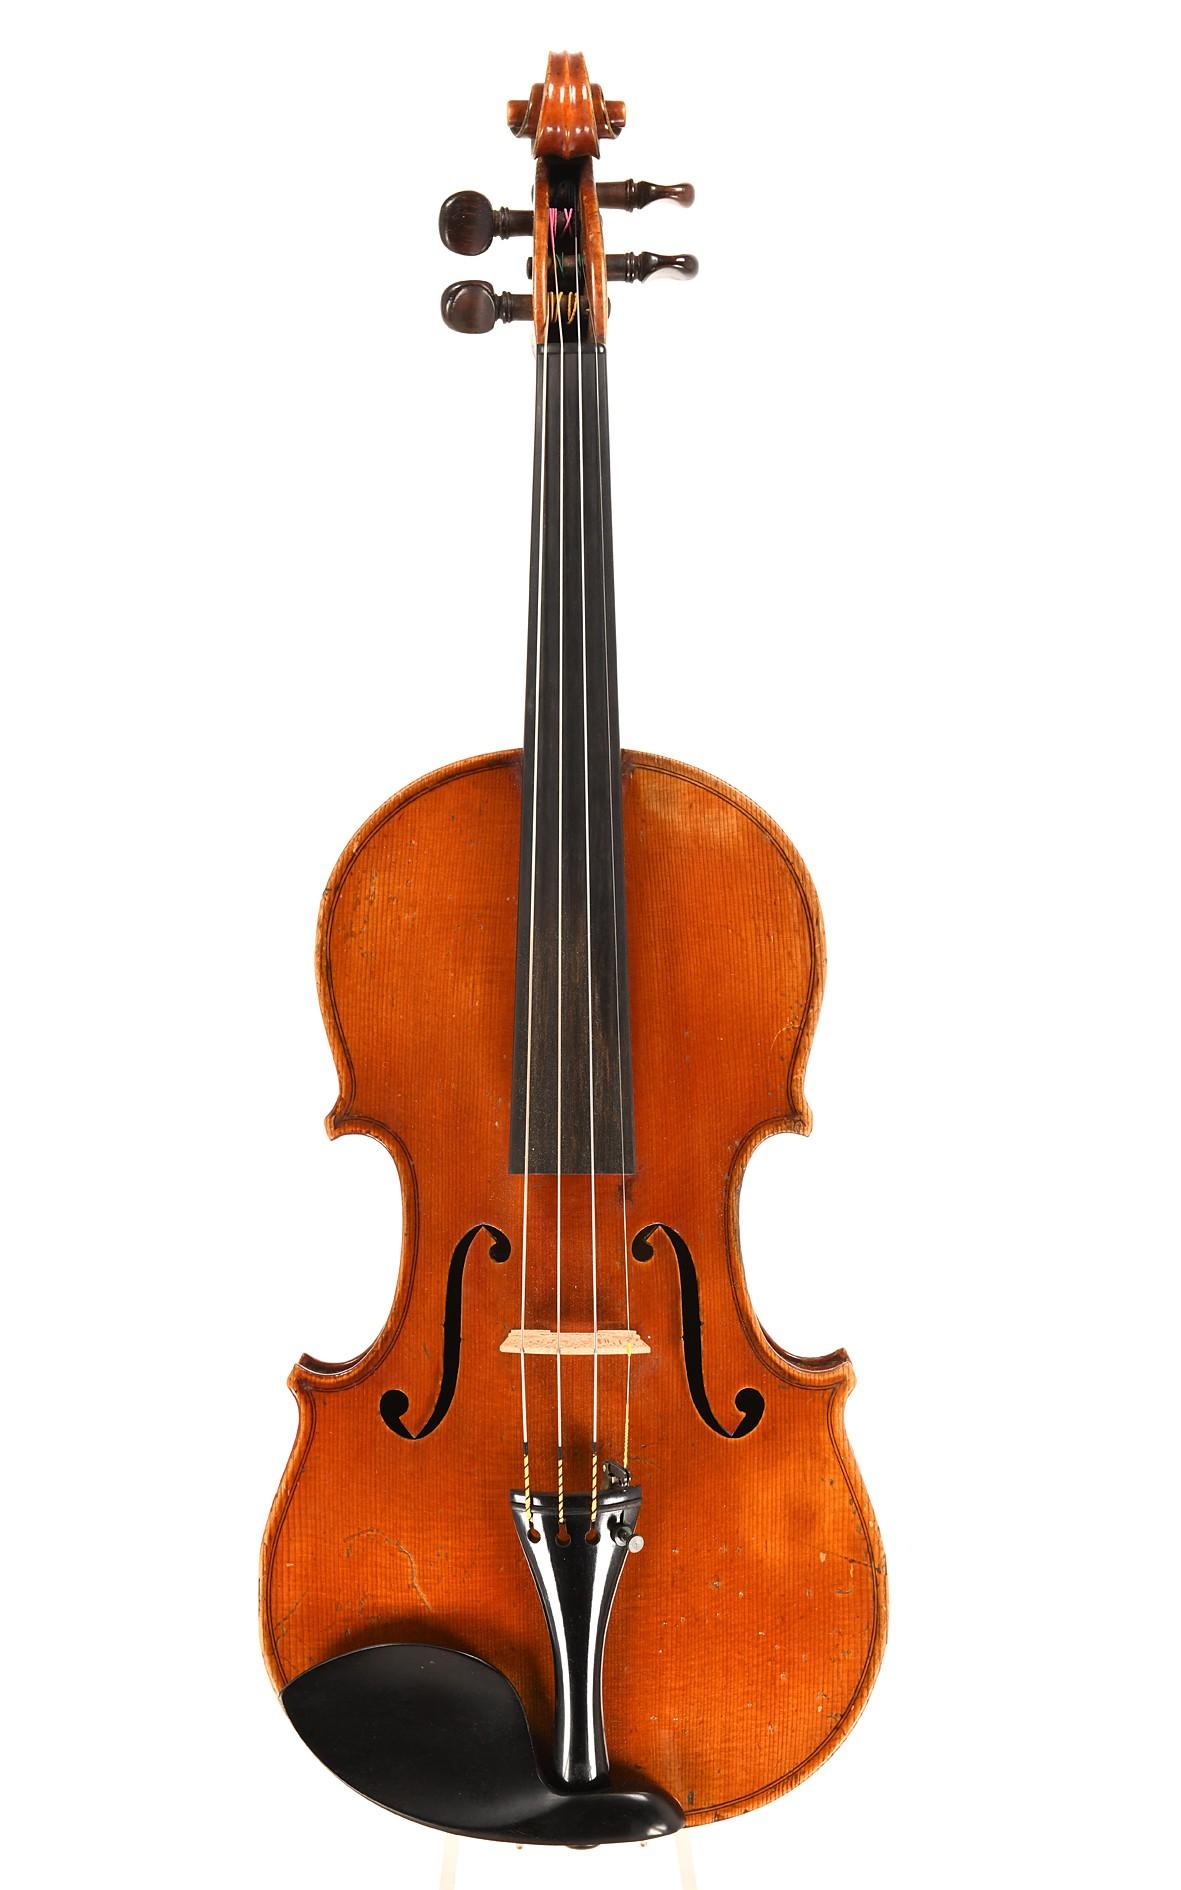 H. Derazey workshop, late 19th century French violin - top